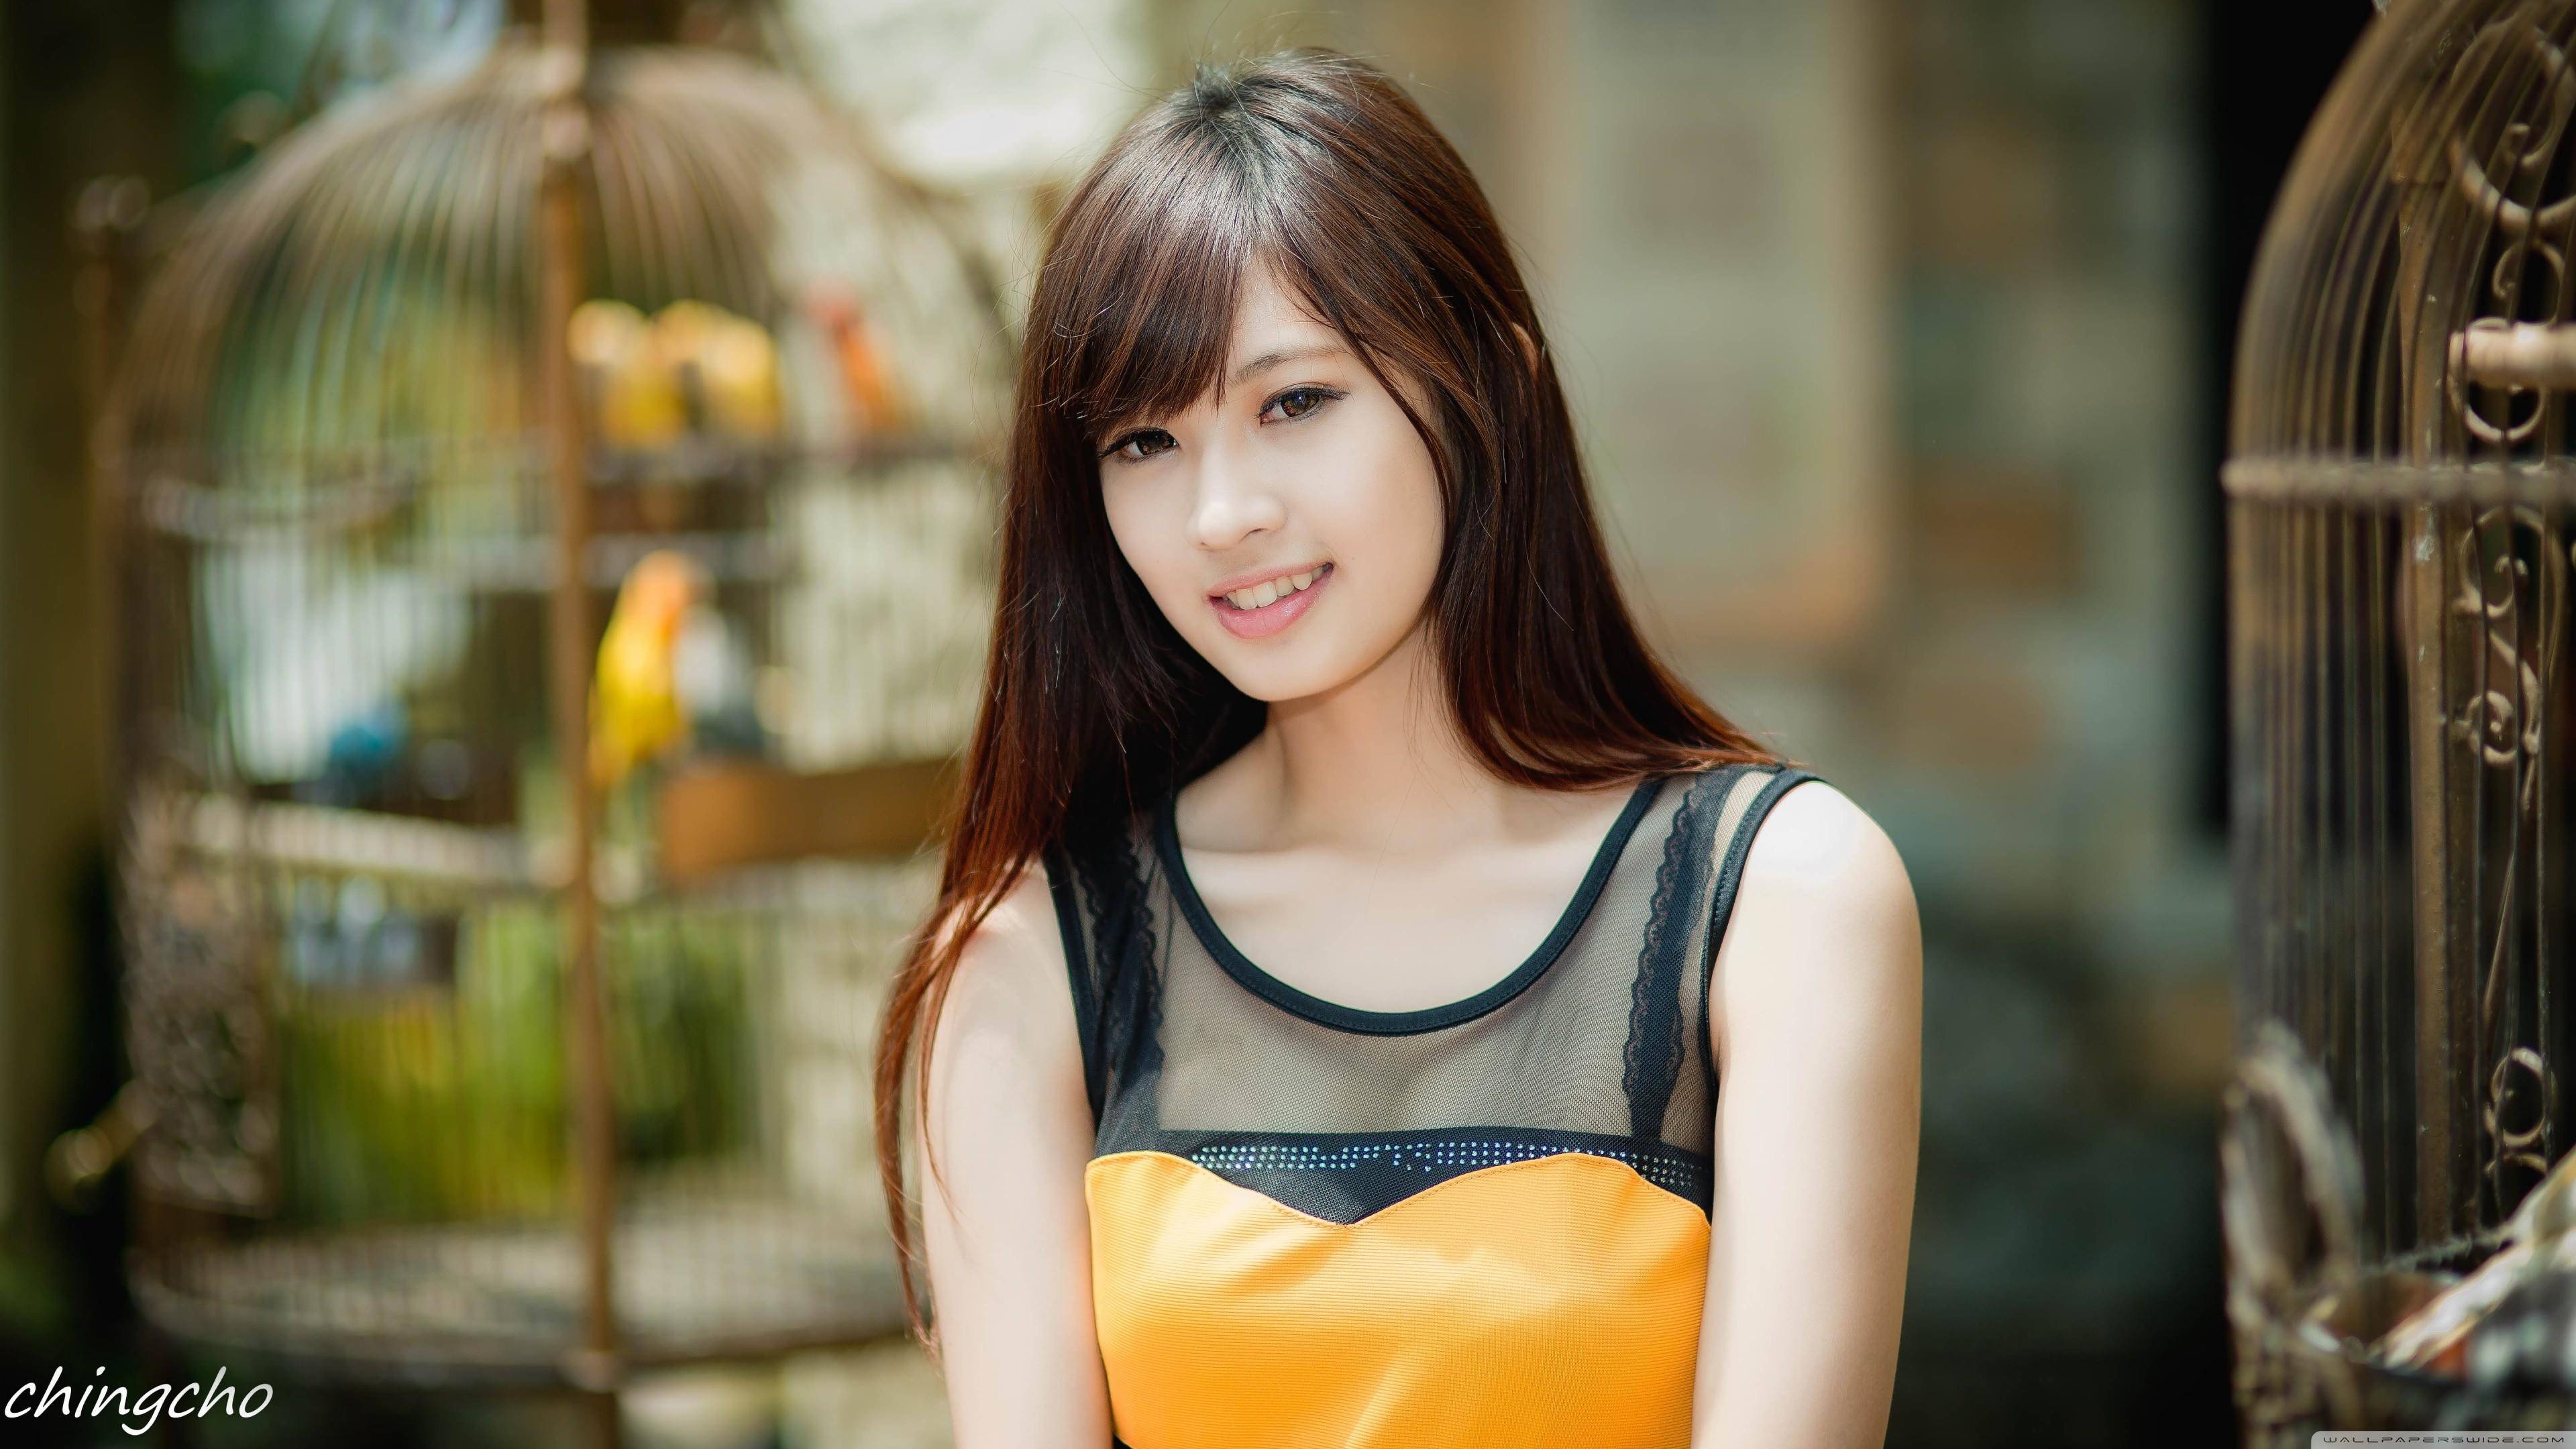 Asian 4k Ultra Hd Wallpaper And Background - Beautiful Asian Girls Uhd - HD Wallpaper